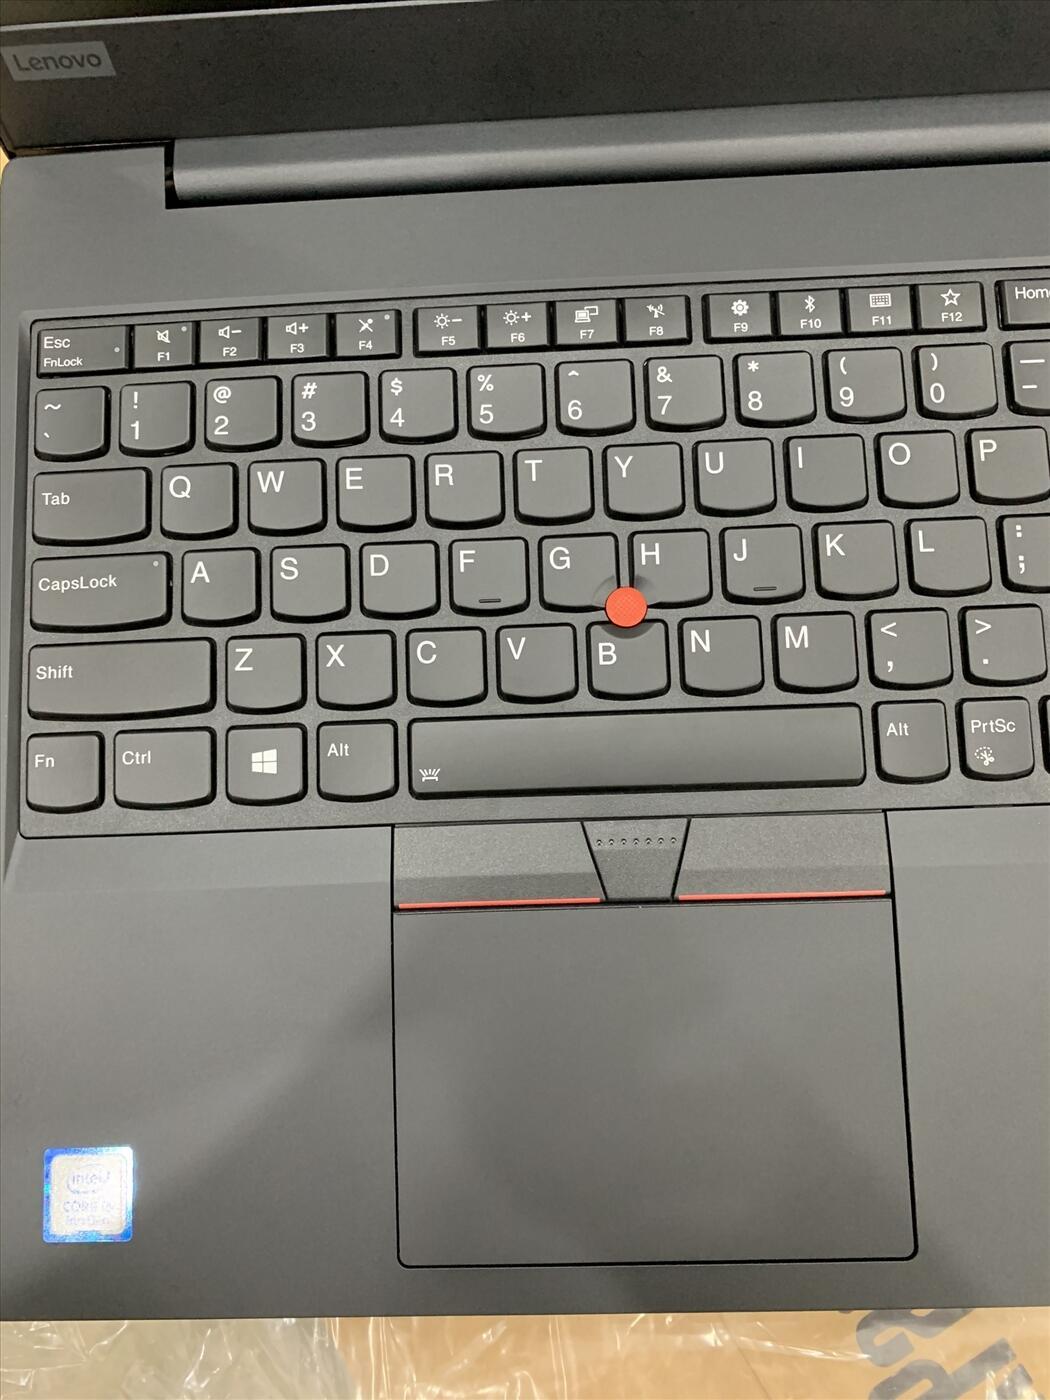 Lenovo Thinkpad E590 Core i5 8265U, Ram 4GB, 1000GB + khe NVme, Màn 15.6 inch New 100%